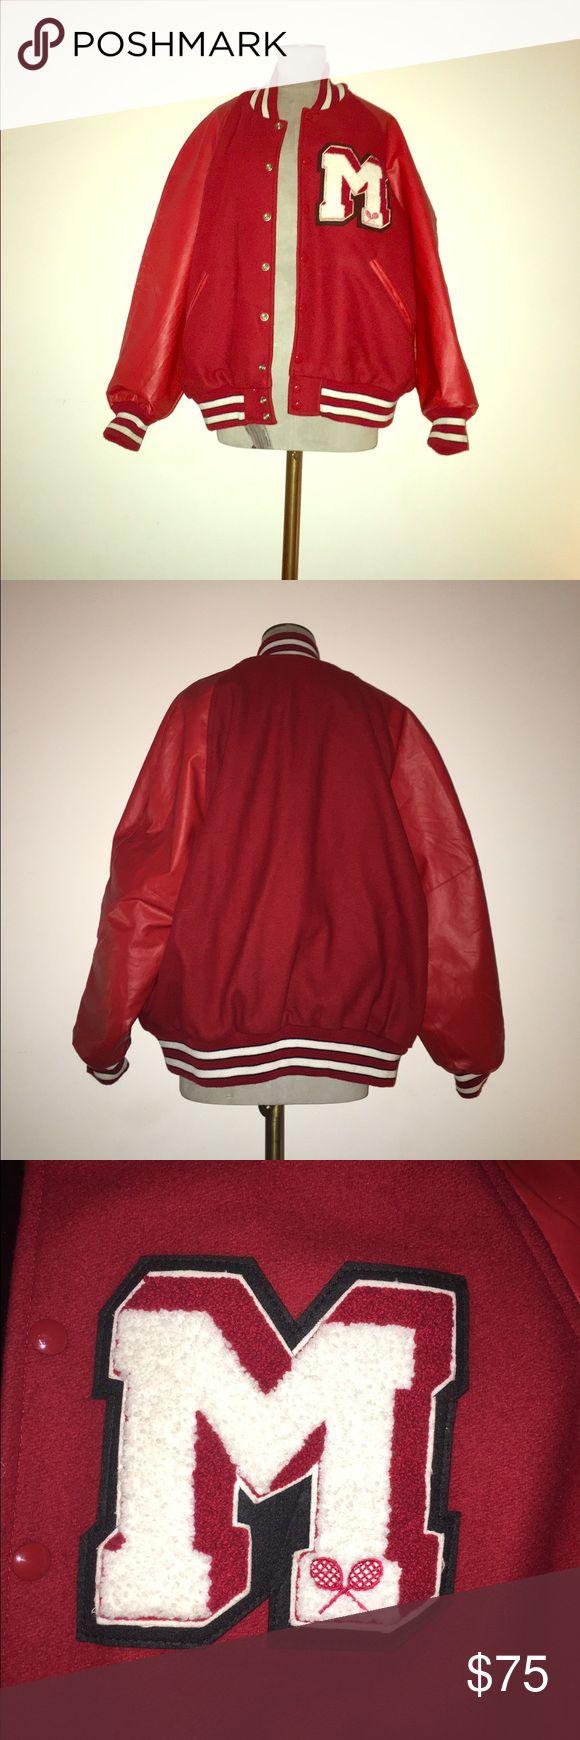 Vintage Varsity Letterman's  Jacket Bright red Letterman's varsity jacket Vintage Jackets & Coats